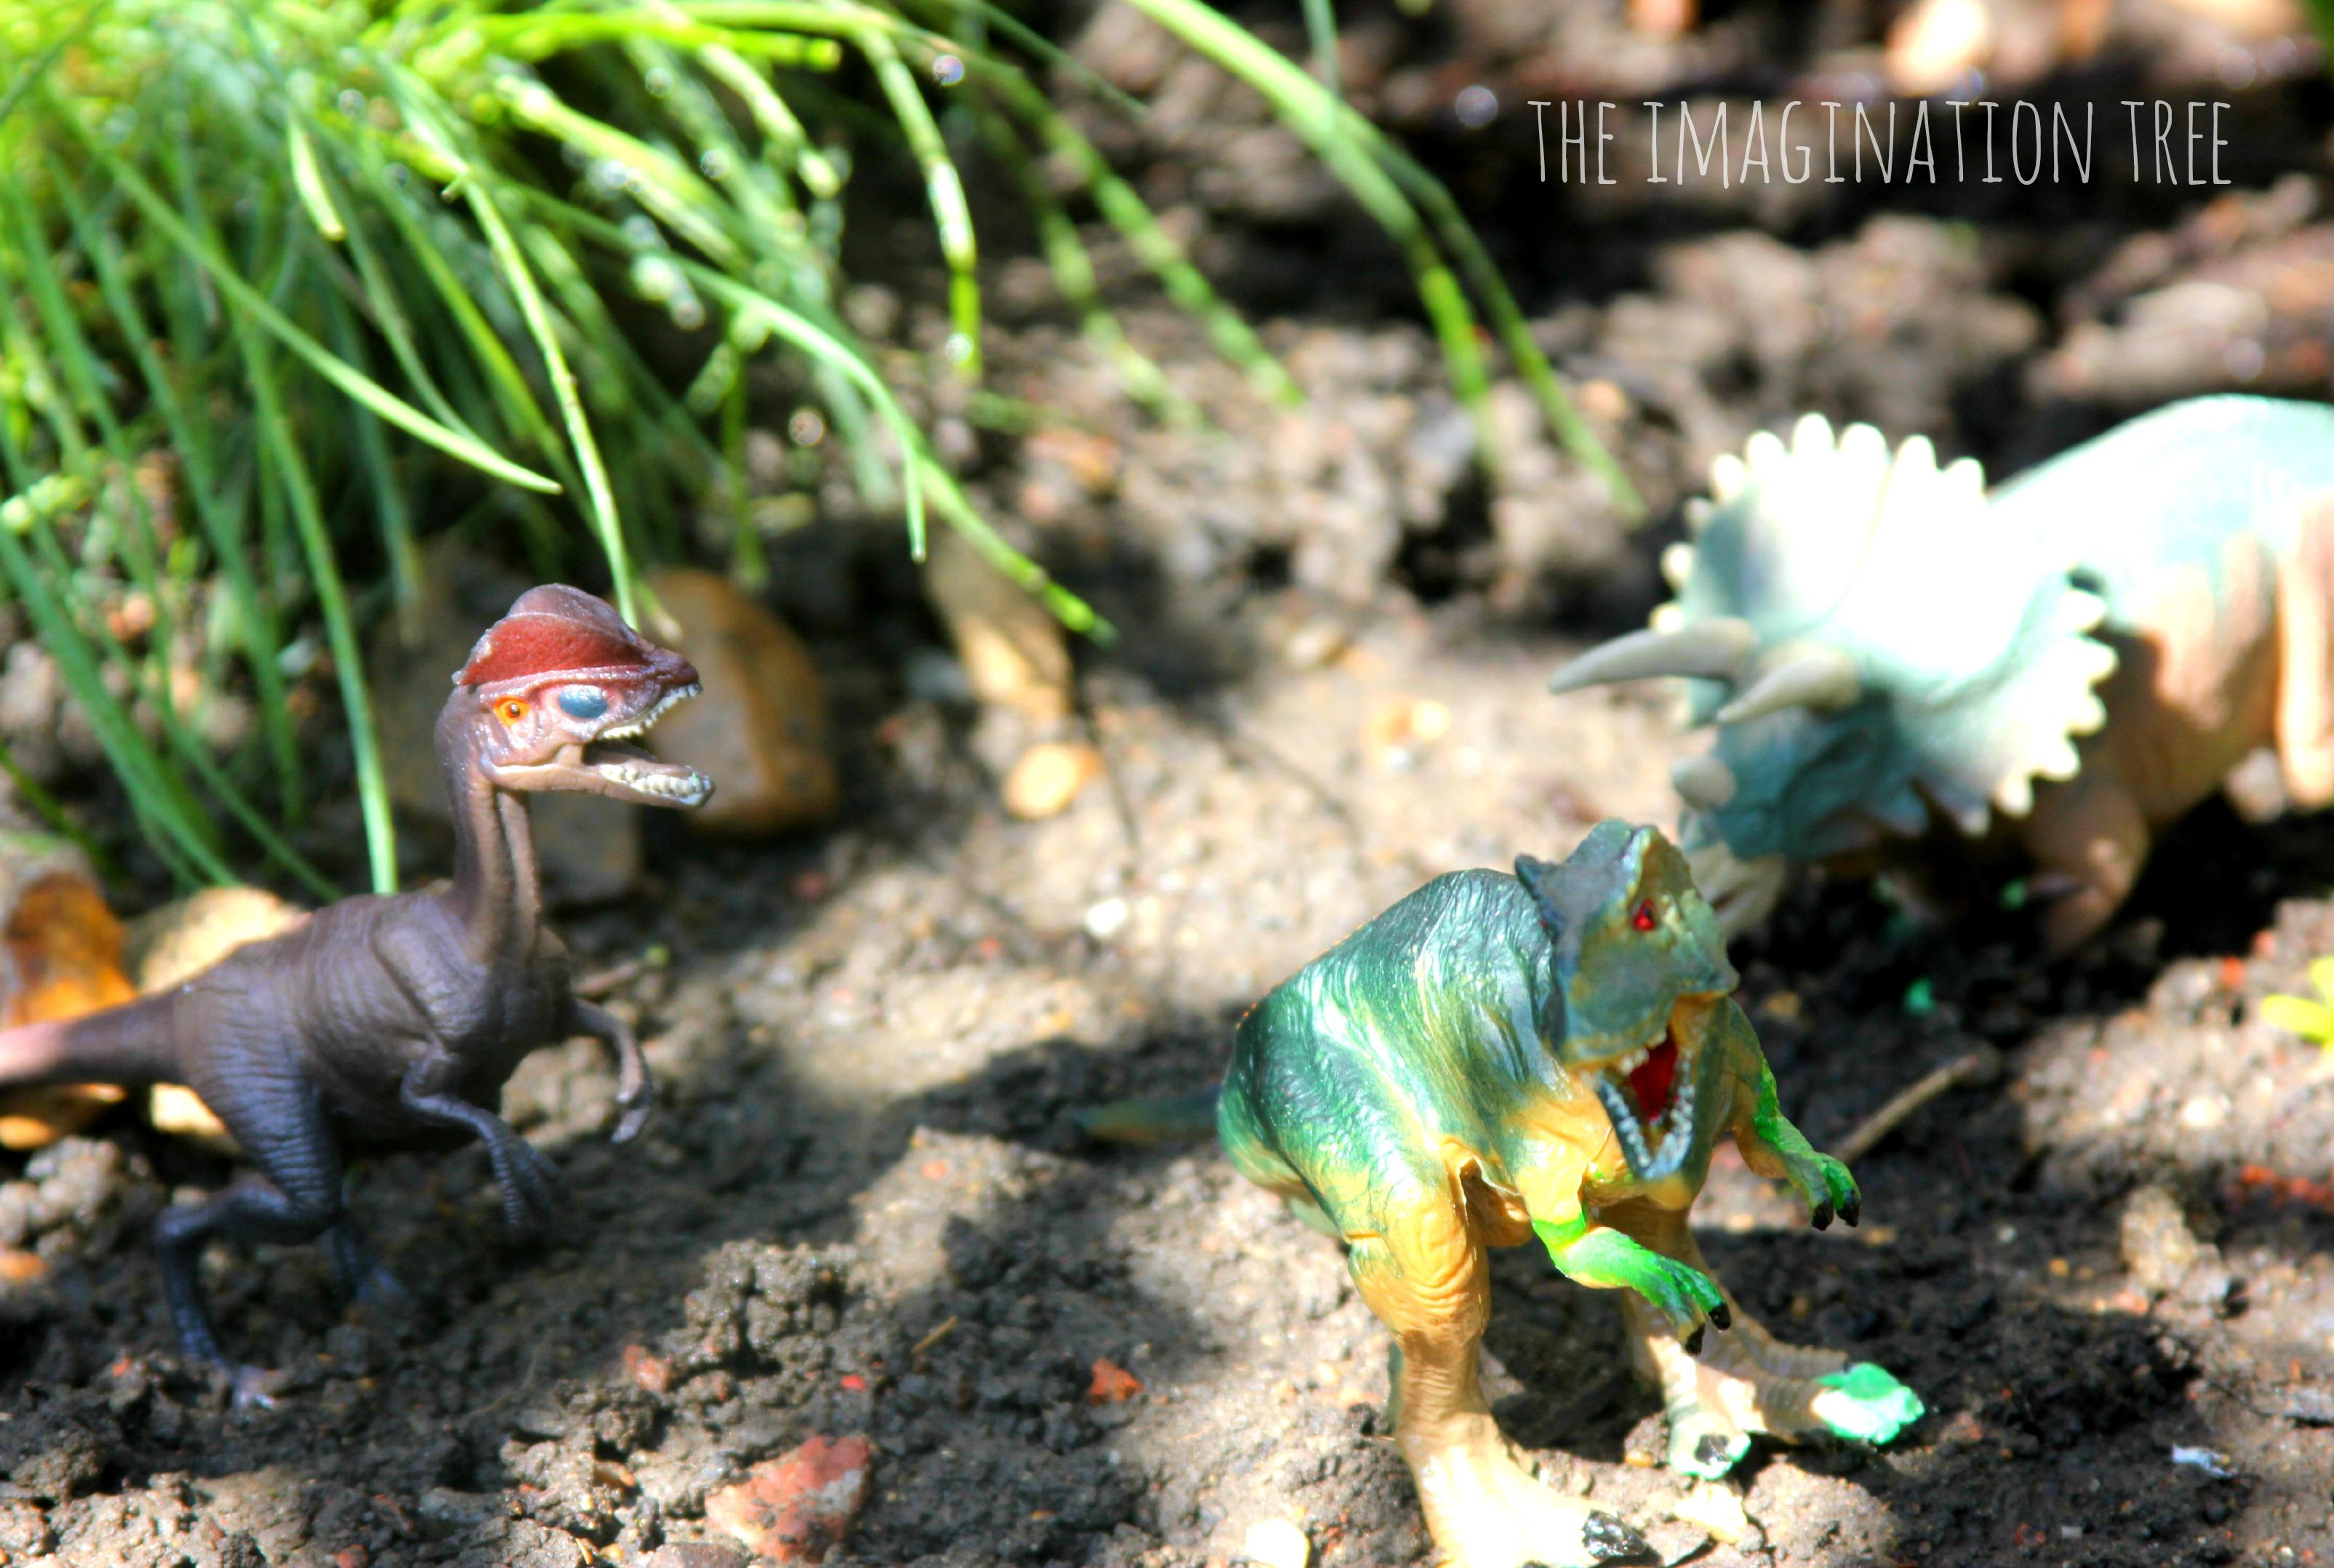 Small World Play: Dinosaur Garden - The Imagination Tree